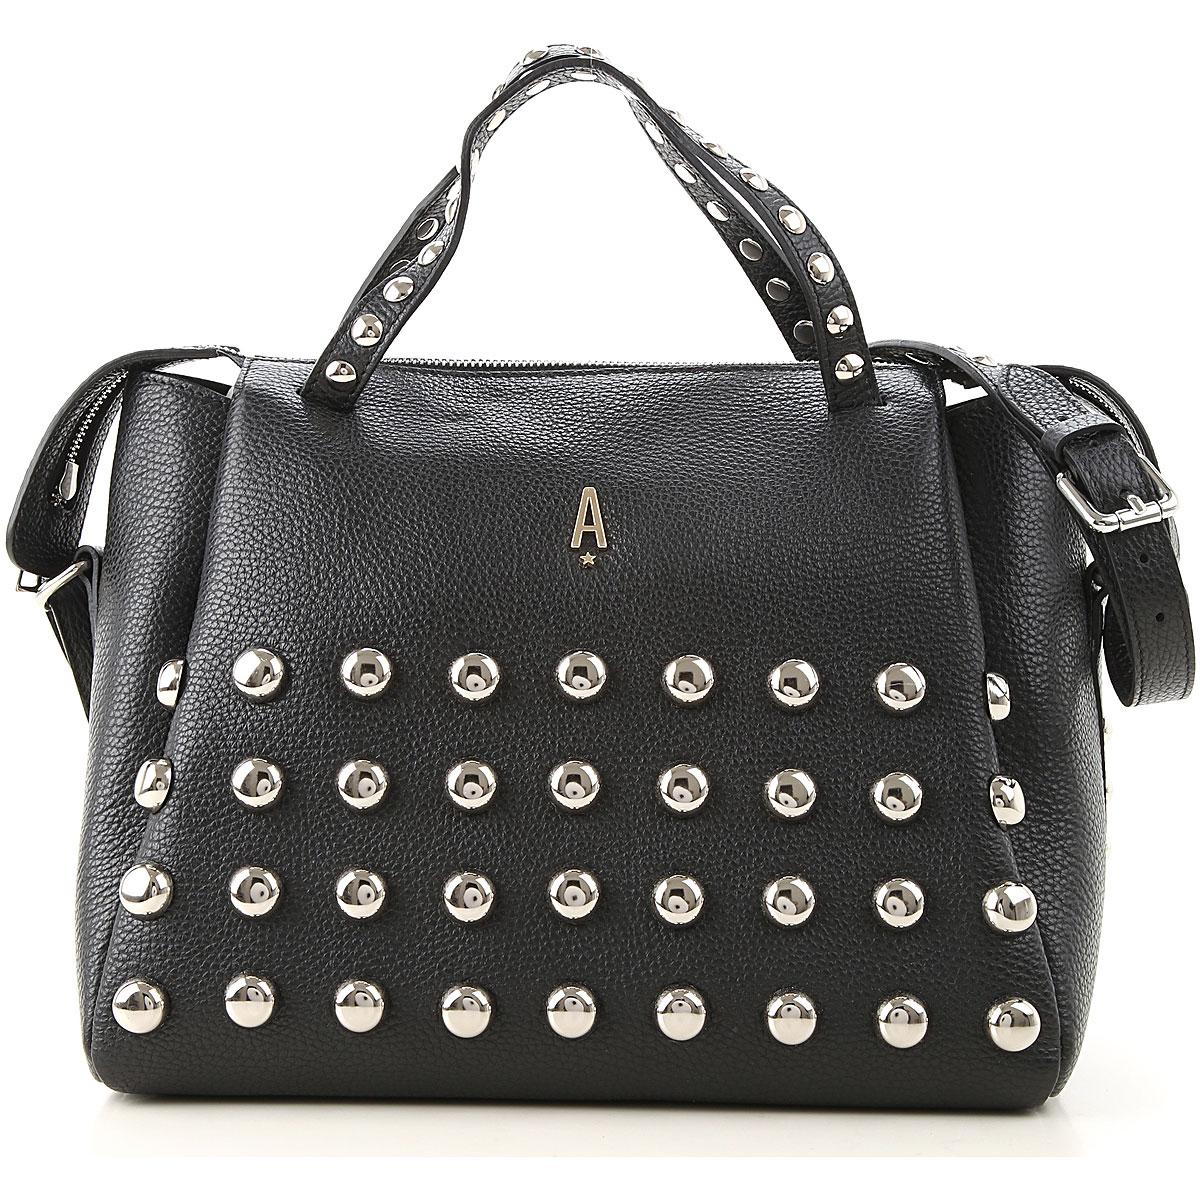 Aniye By Shoulder Bag for Women On Sale, Black, Leather, 2019